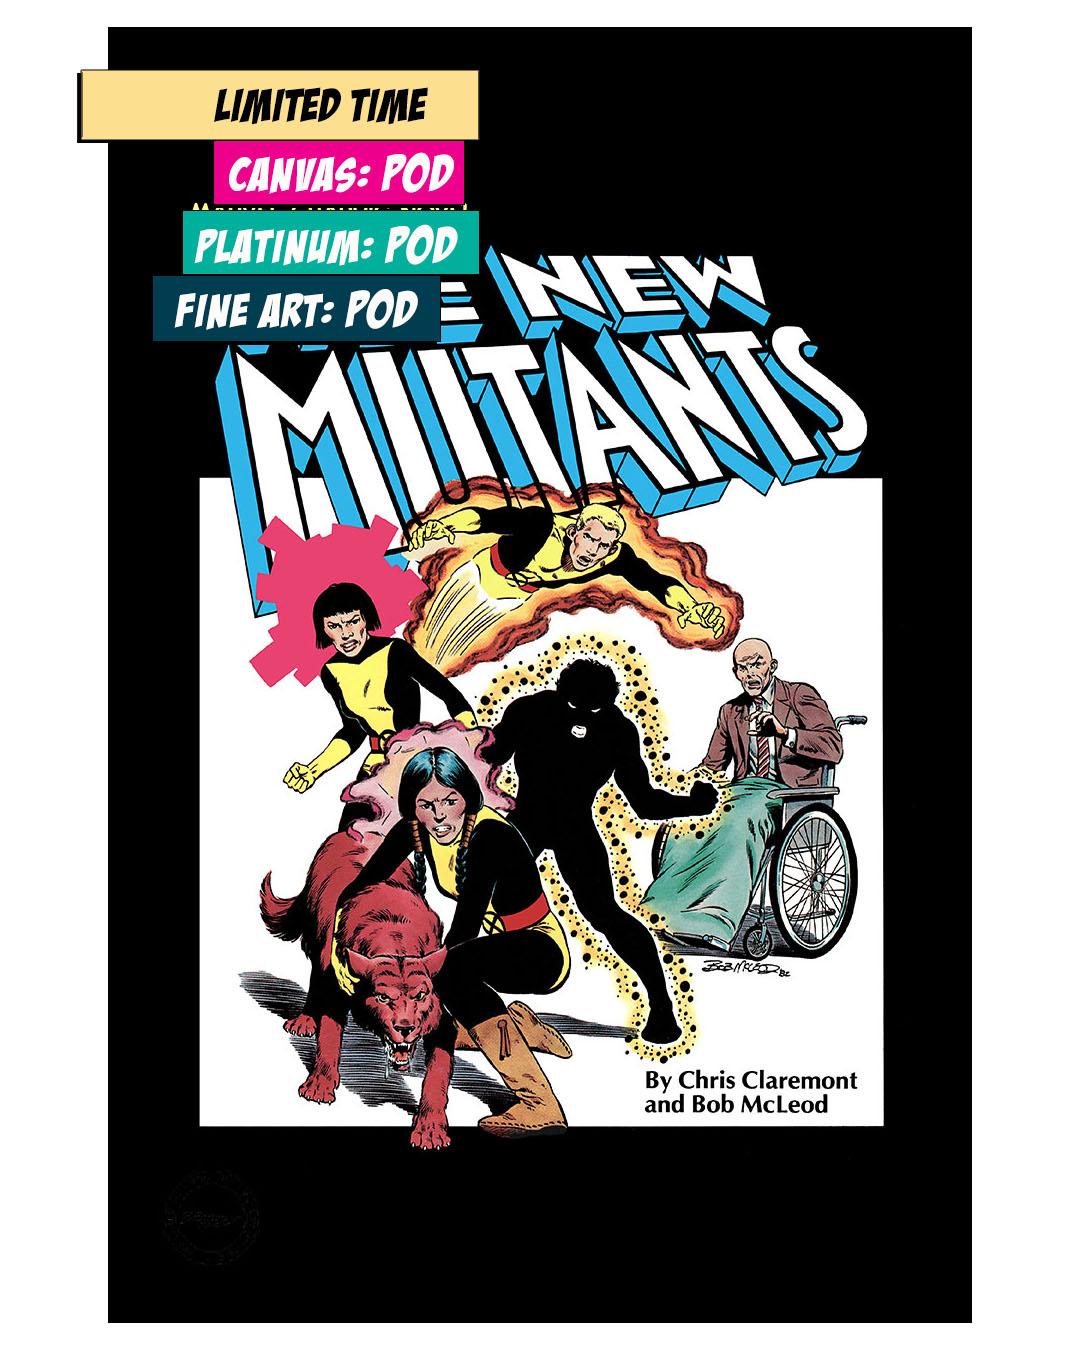 THE NEW MUTANTS: GRAPHIC NOVEL #4